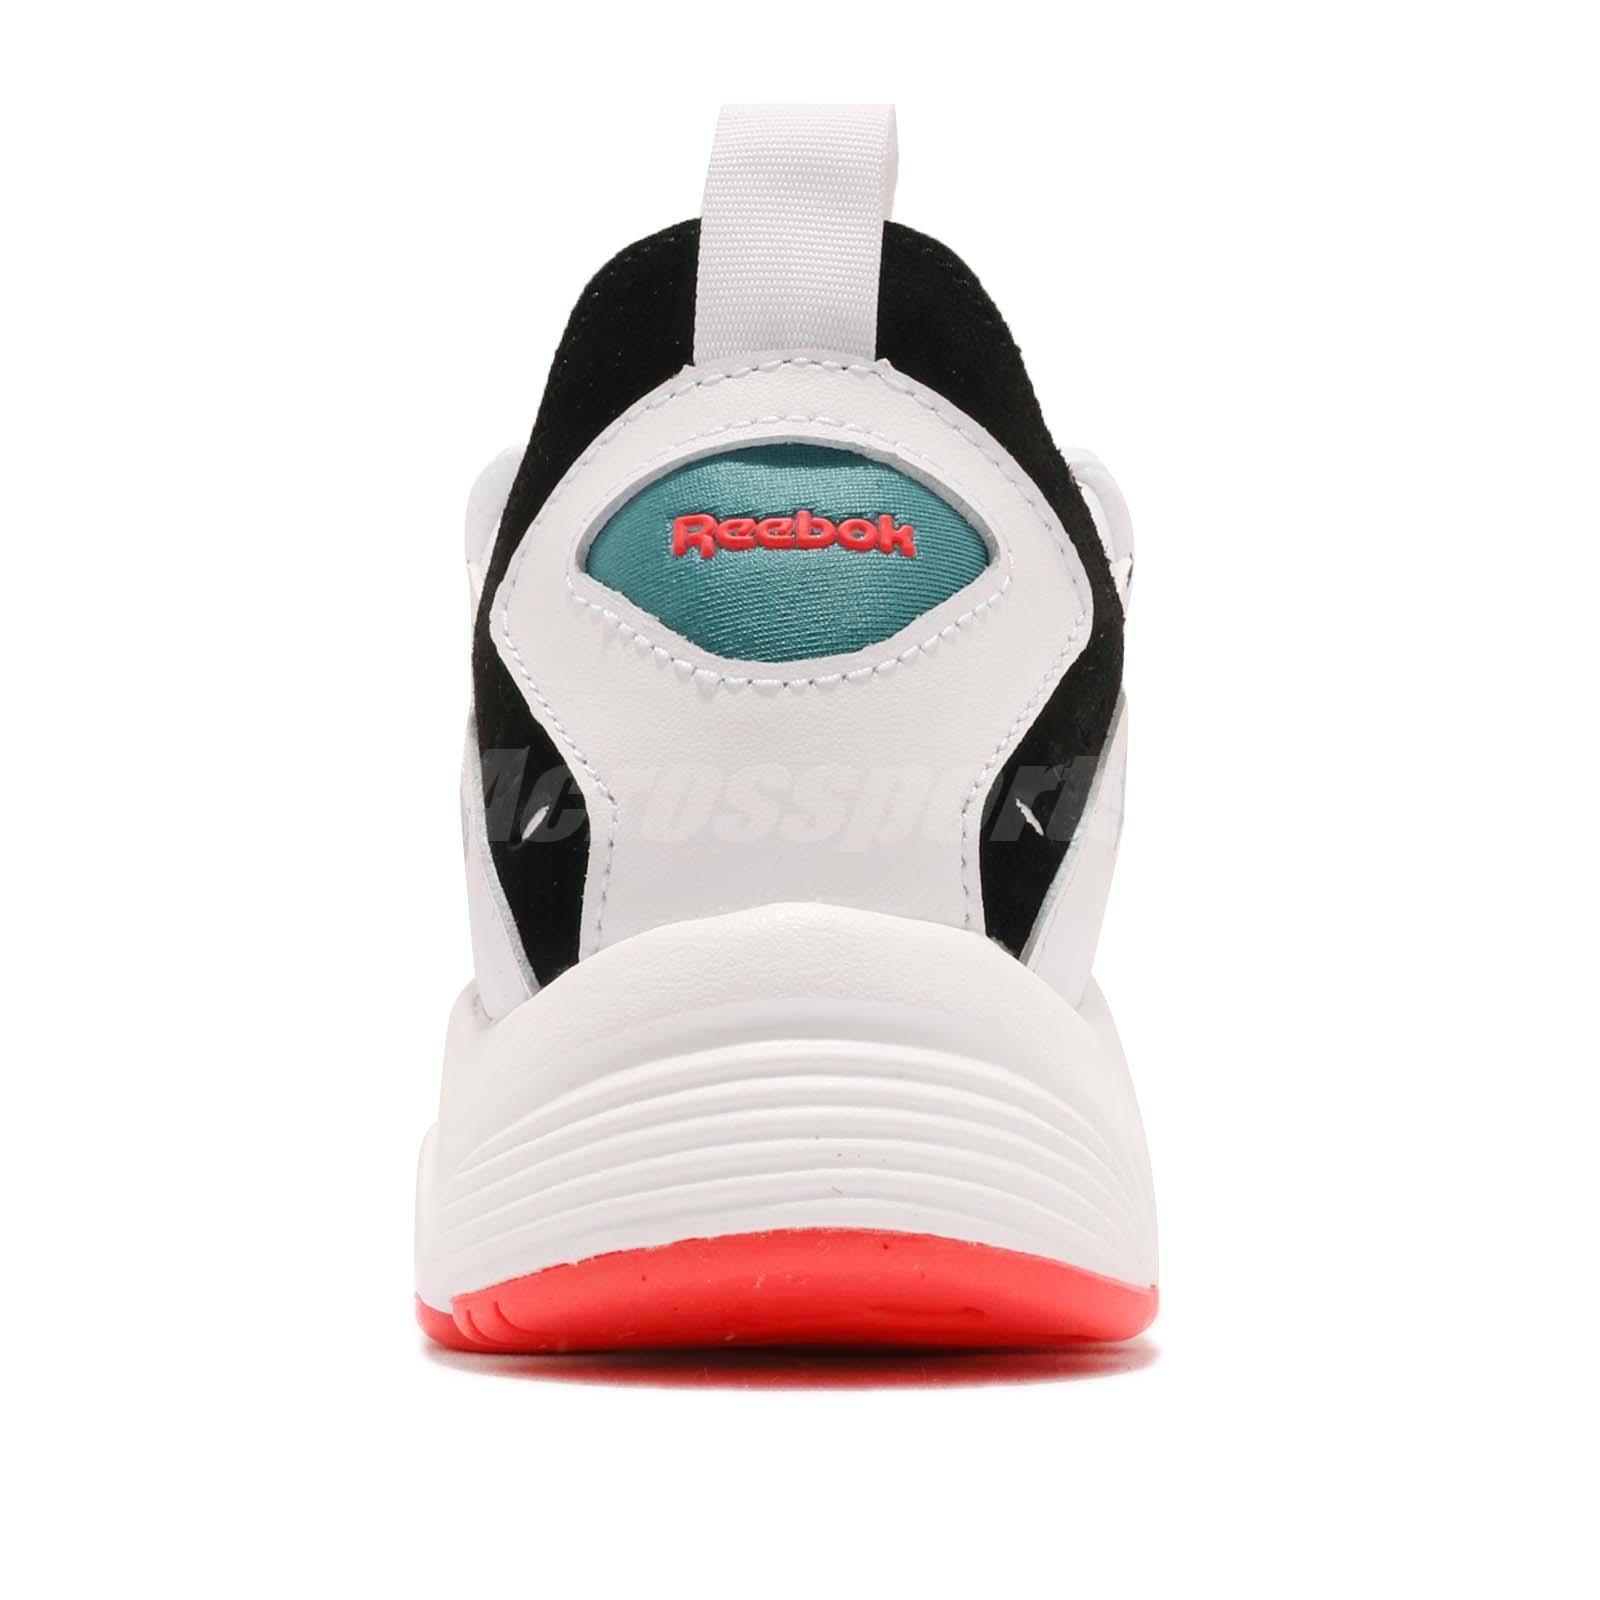 f1cf28286378f5 Reebok DMX Series 1200 White Black Neon Red Men Running Daddy Shoes ...